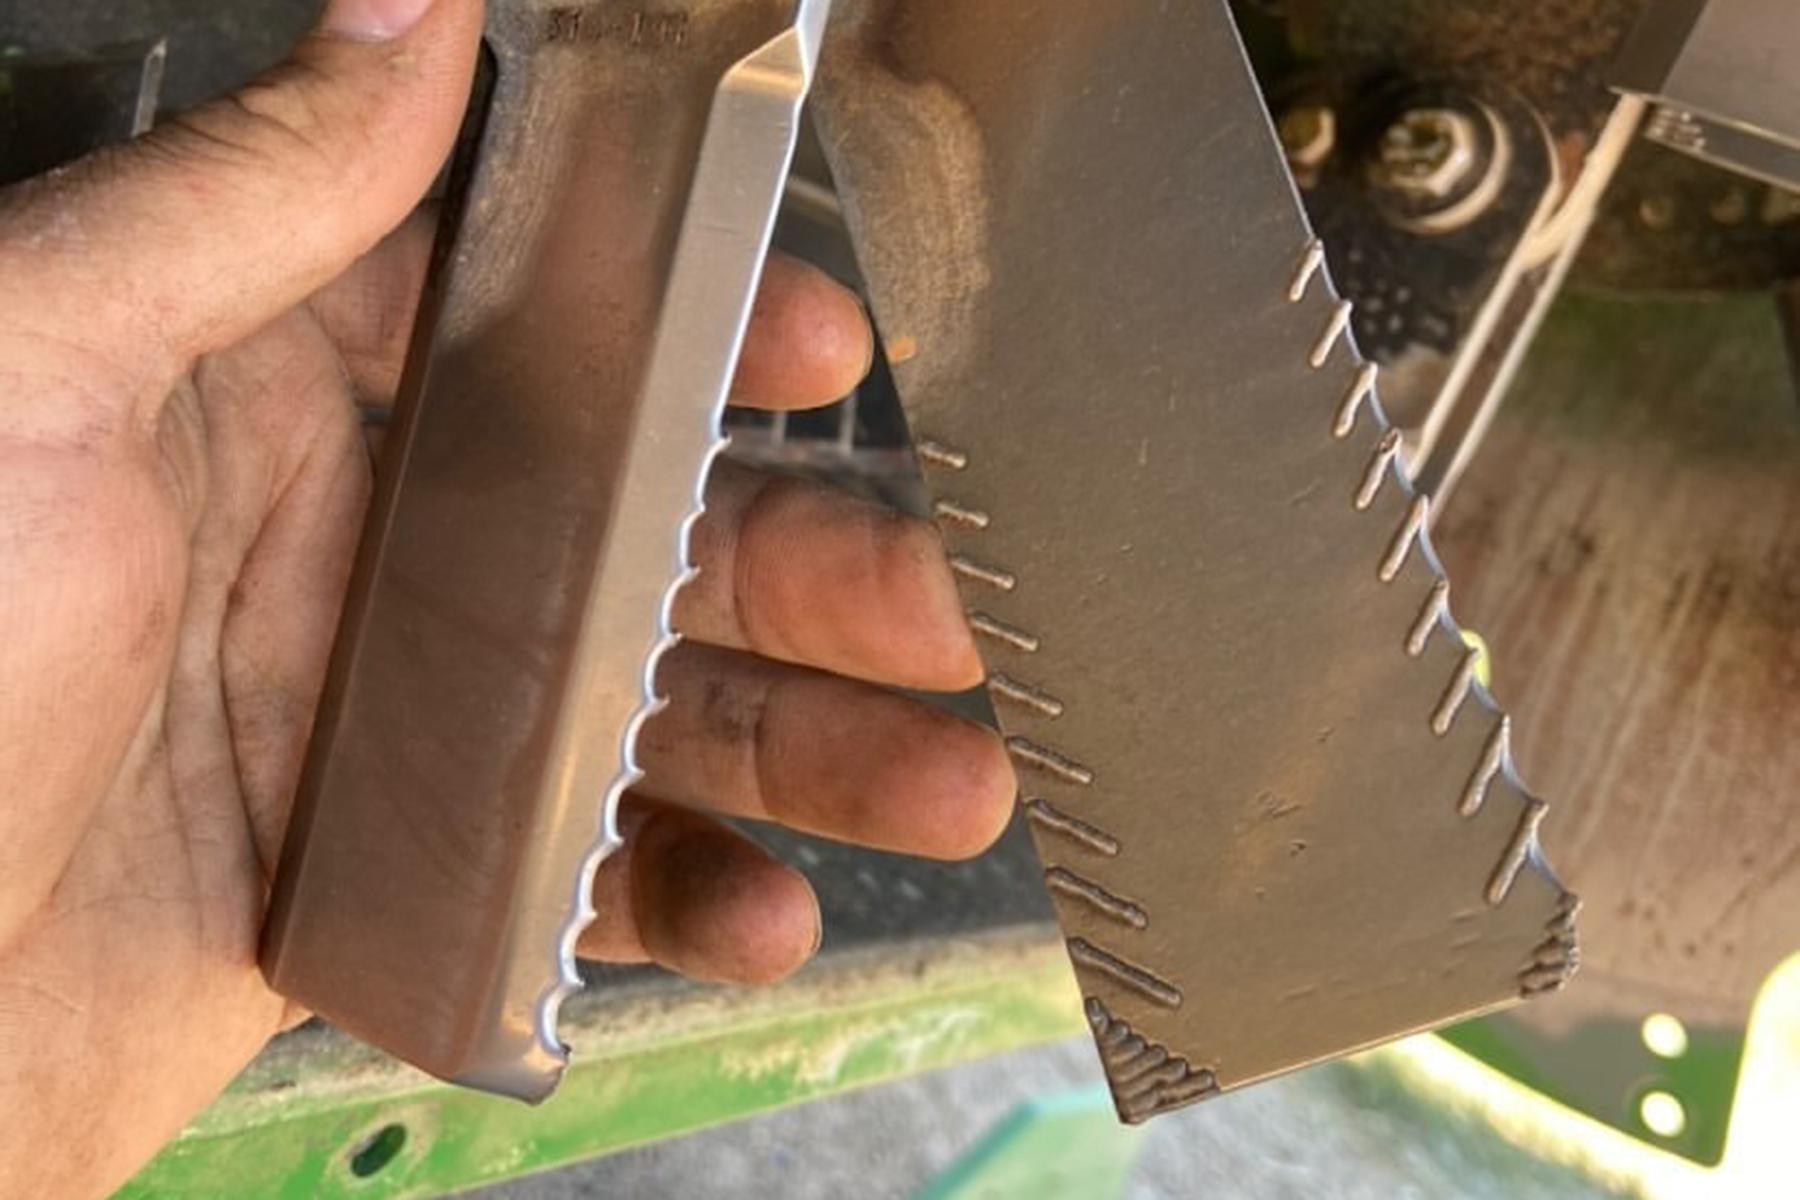 Serration pattern formed on used Straw Claw blades